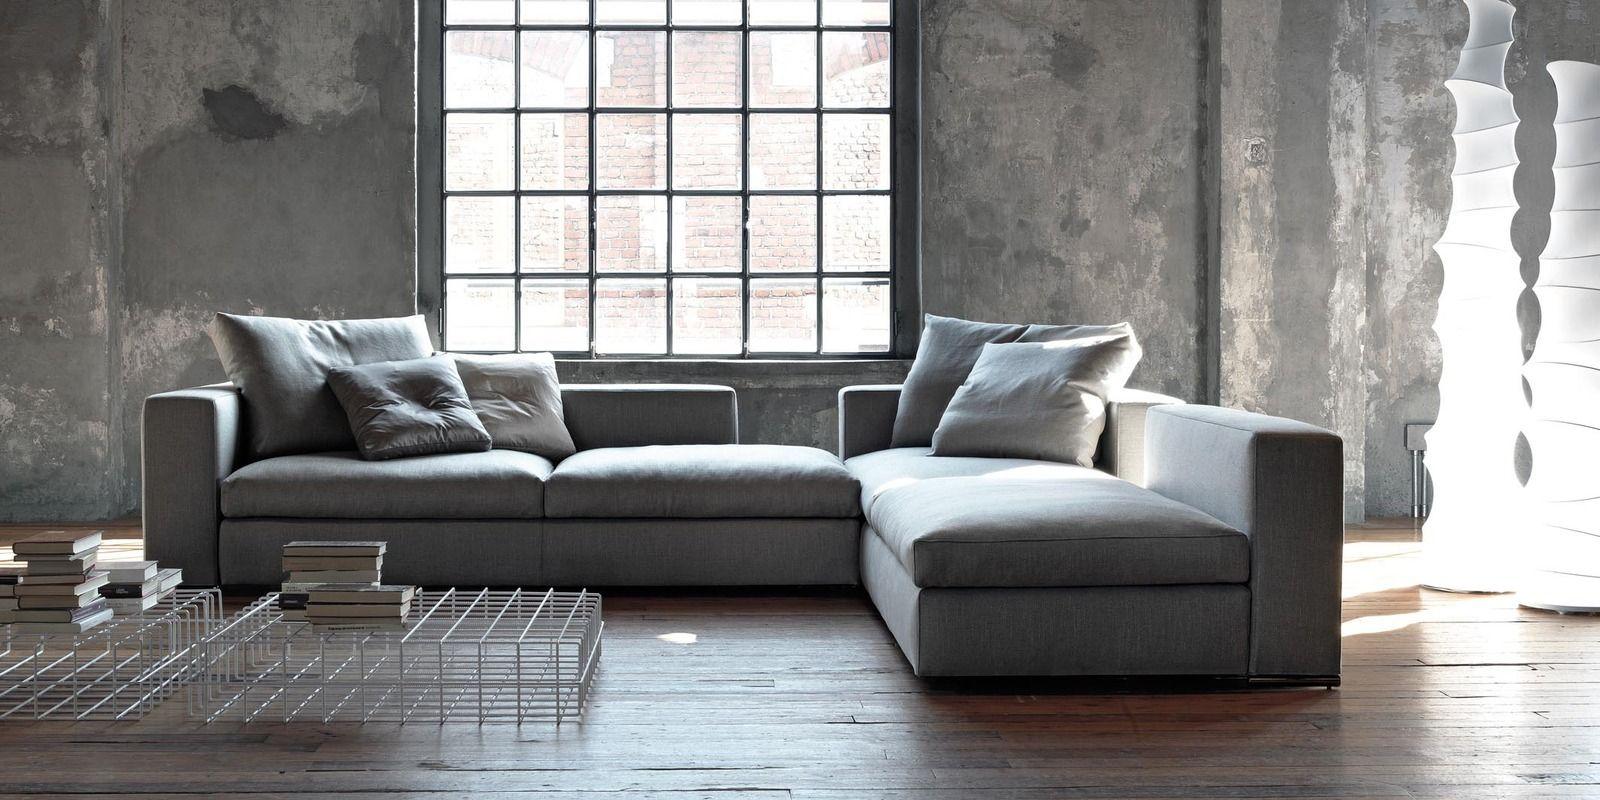 saba italia ananta sergio bicego sofas couches woont interior design pinterest. Black Bedroom Furniture Sets. Home Design Ideas